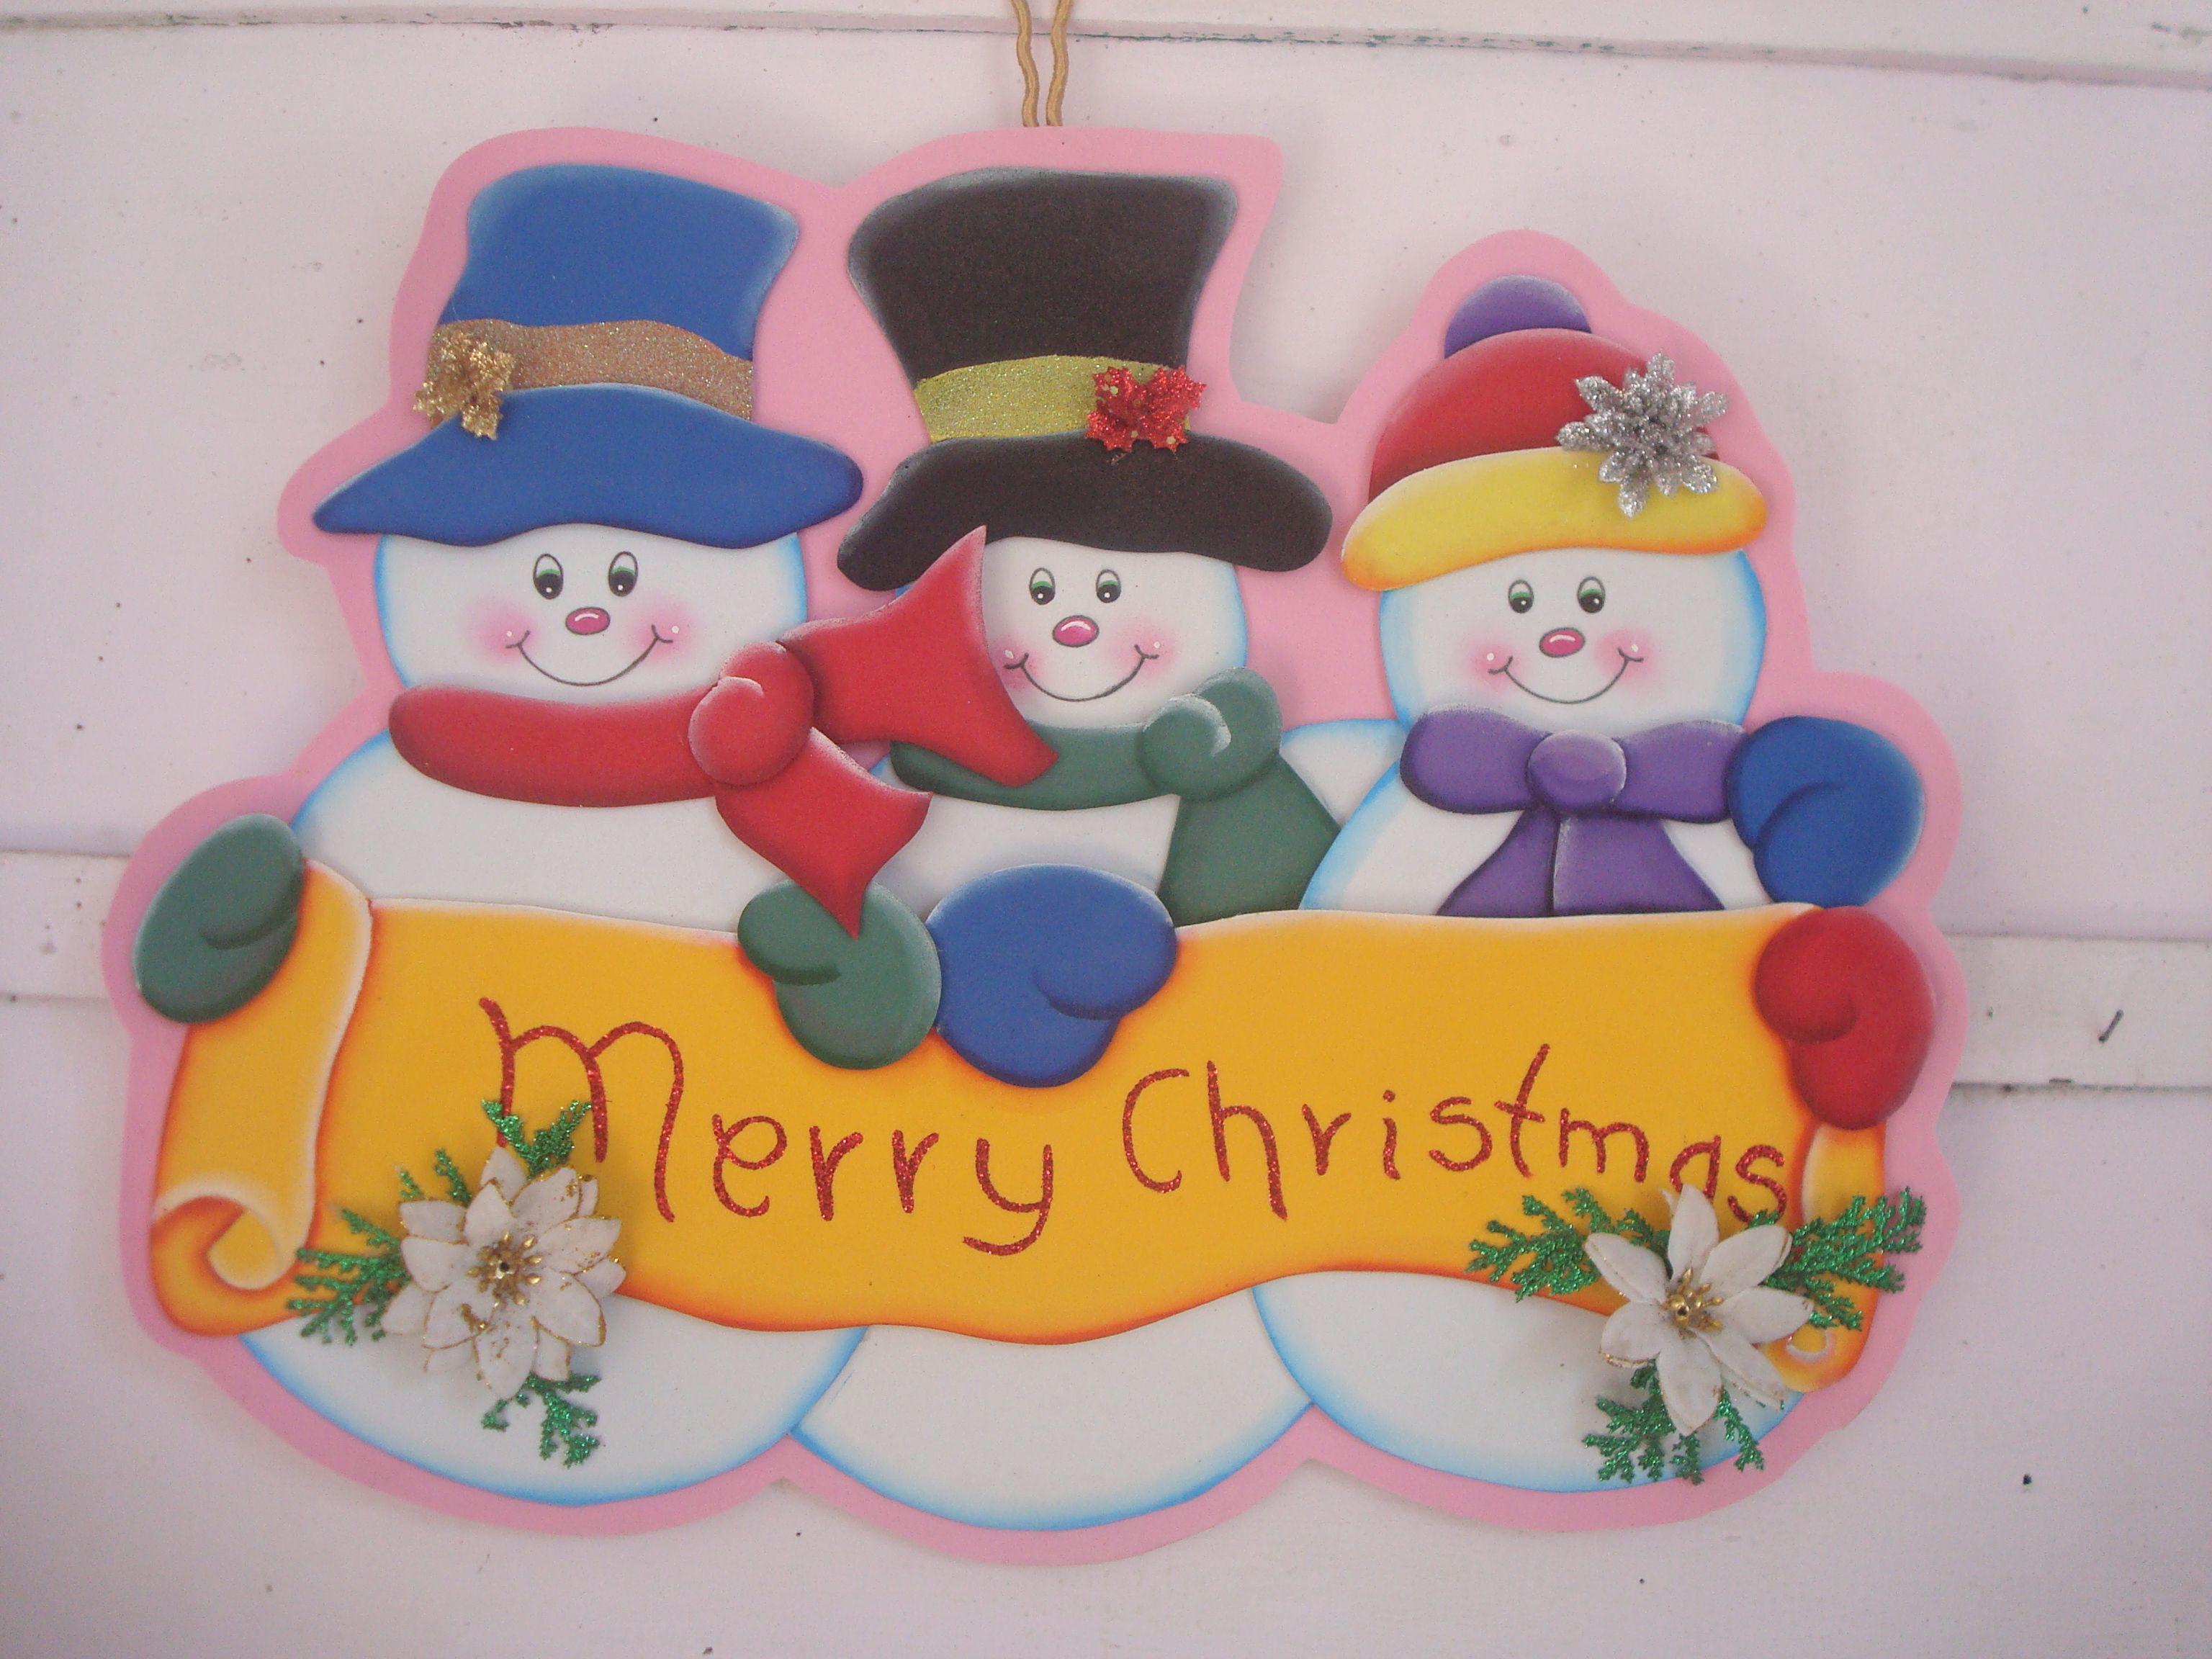 Feliz navidad decoracion navide a pinterest for Decoracion navidena